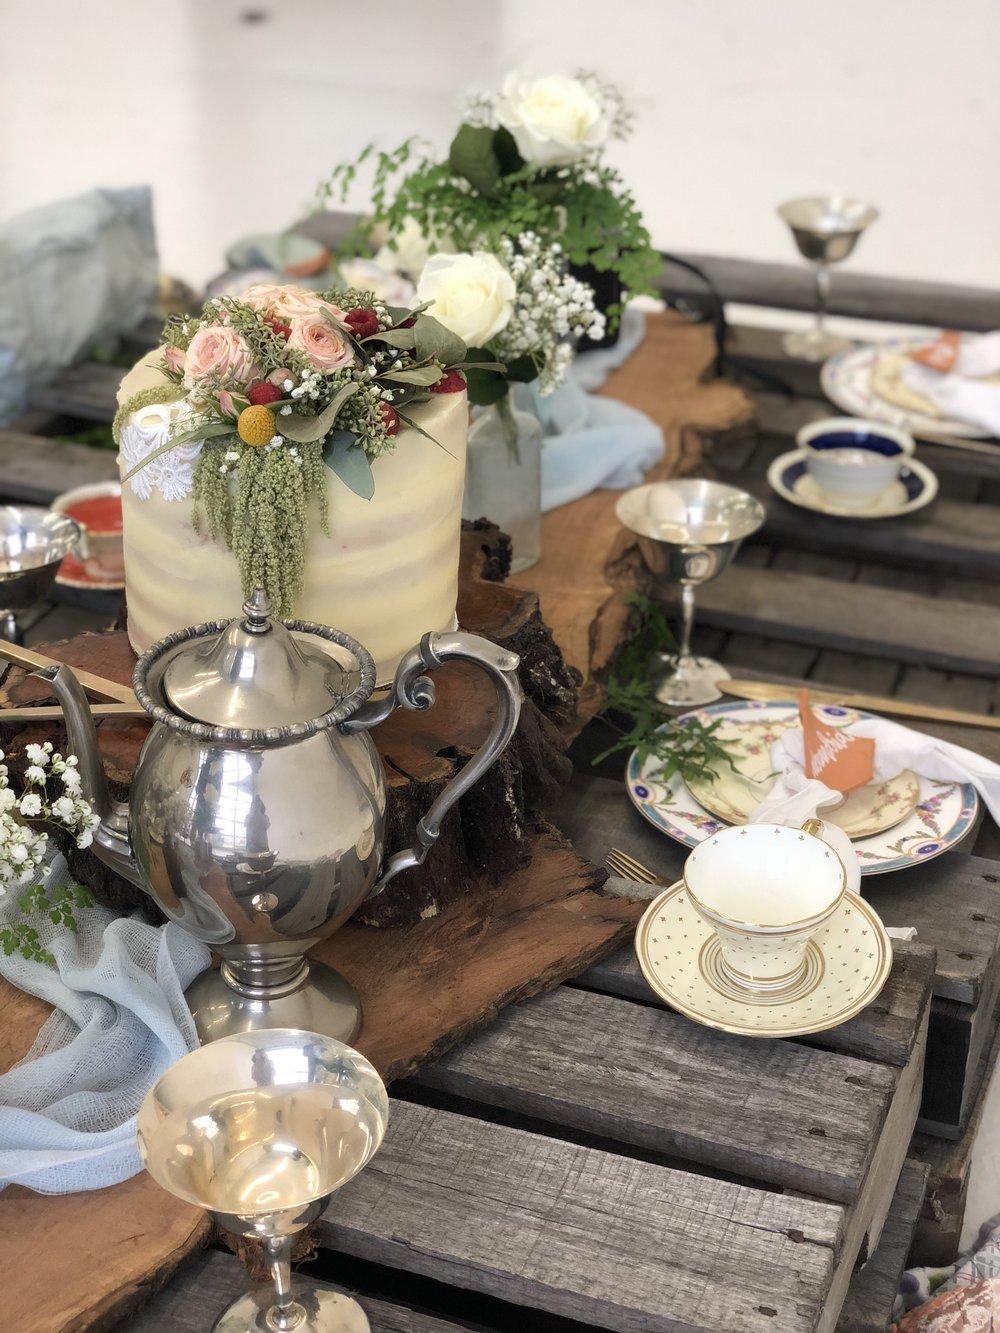 ramble and rove - wedding blogger - styled shoot - Natalia J photogrpahy - wedding styled shoot - pallet table - cedar runner